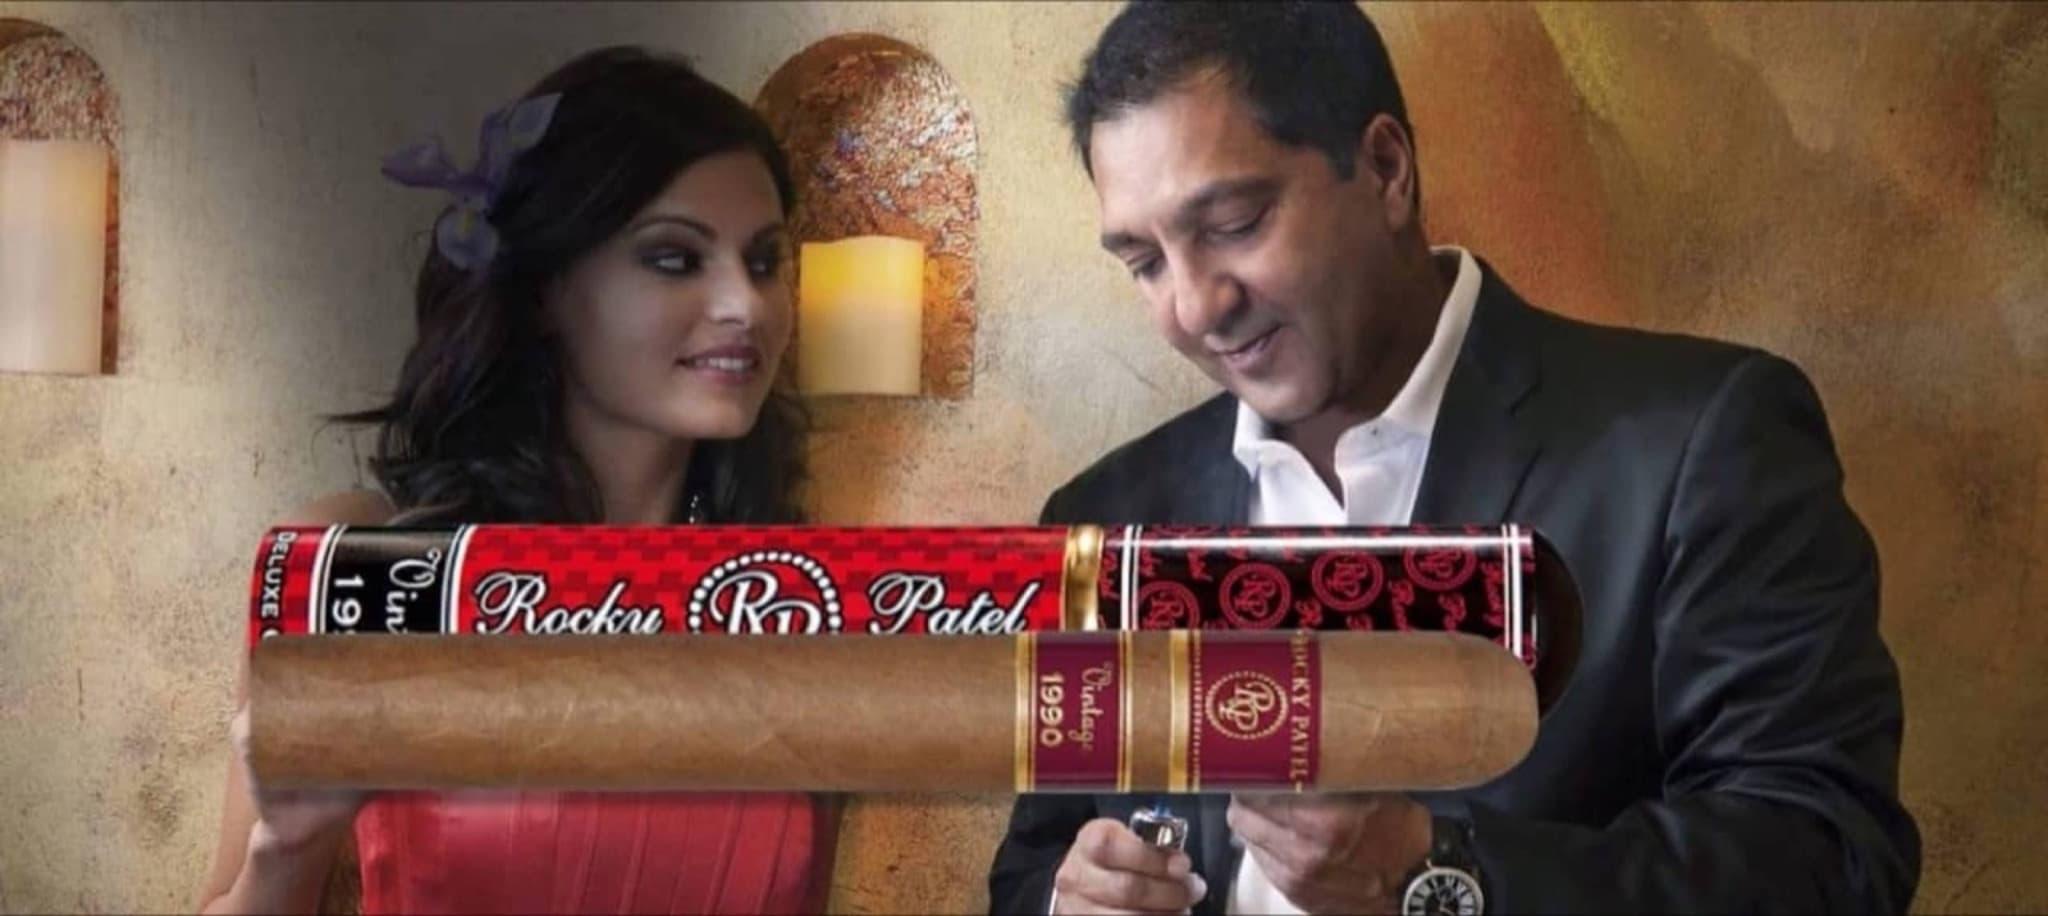 Rocky Patel Vintage Signature 1990 17